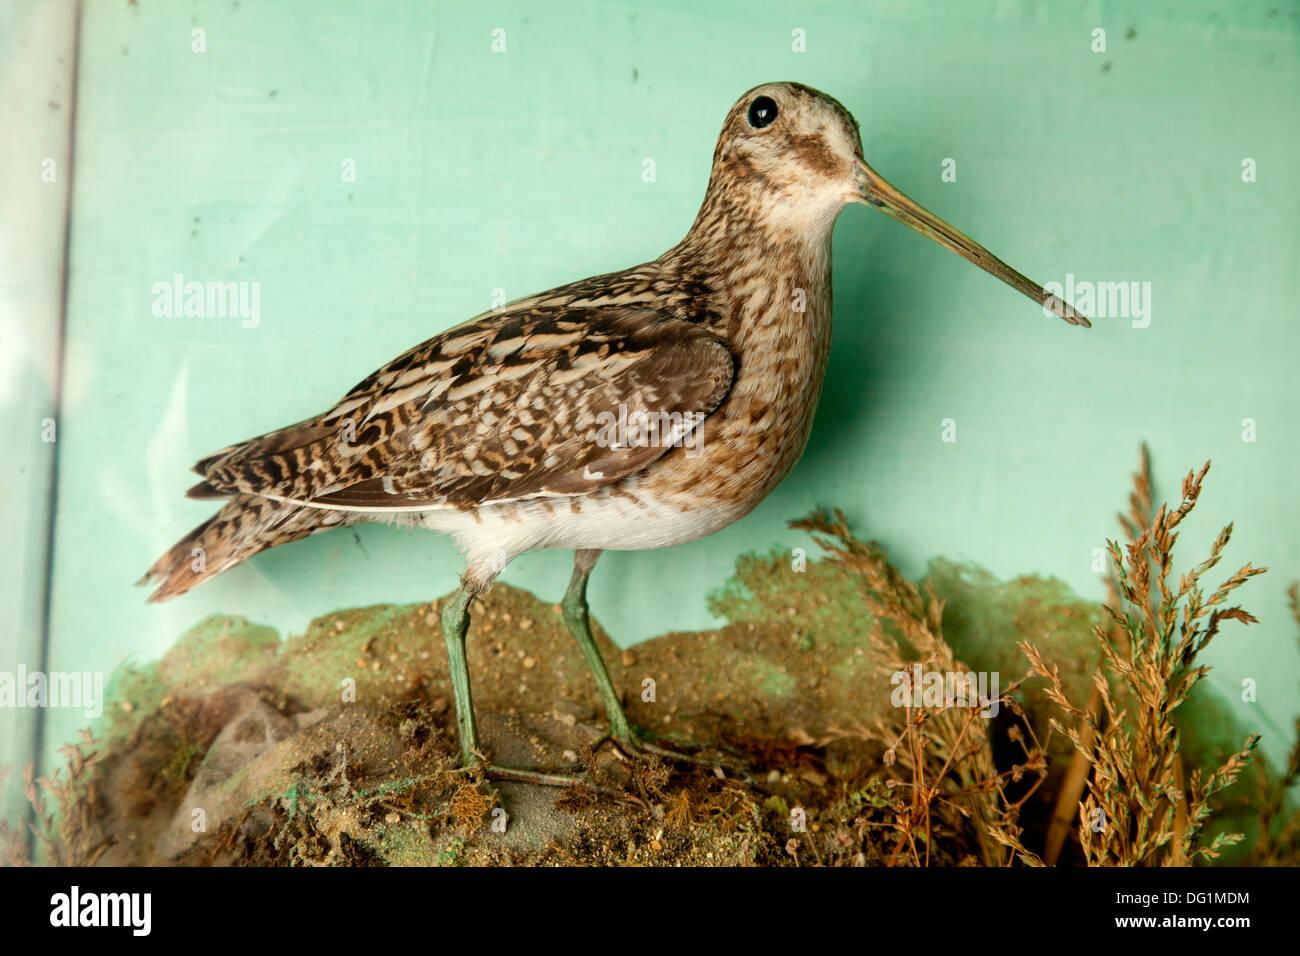 Victorian stuffed Snipe bird in glass display case. - Stock Image